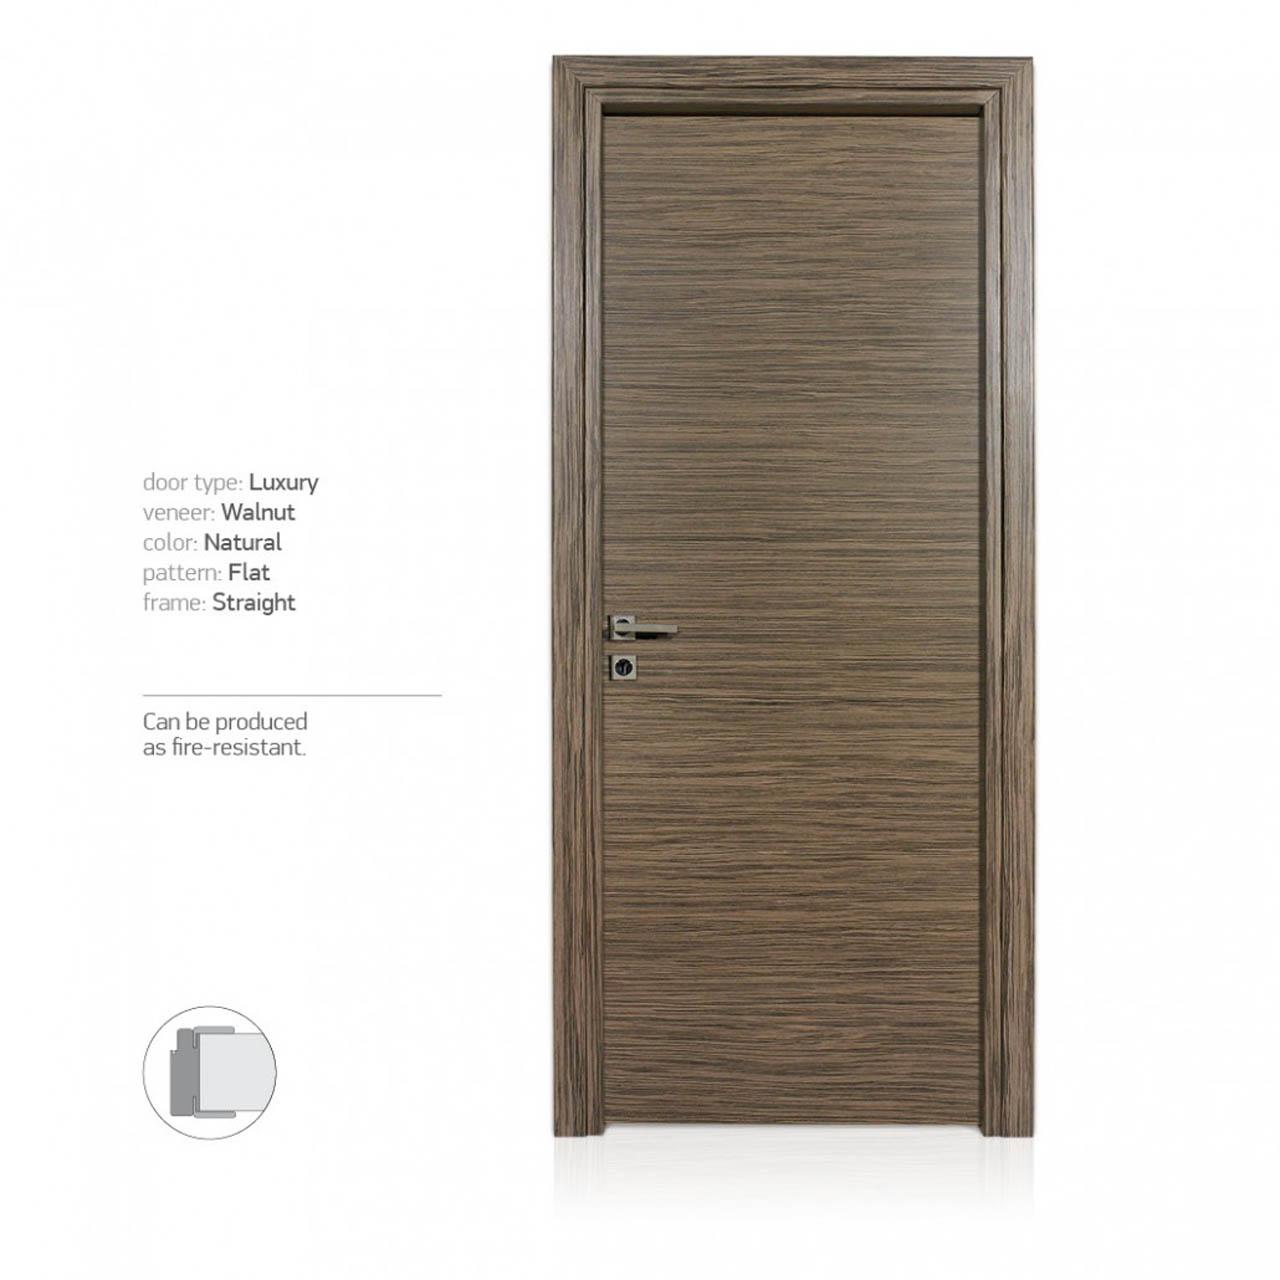 portes-site-luxury-eng11-1030x1030